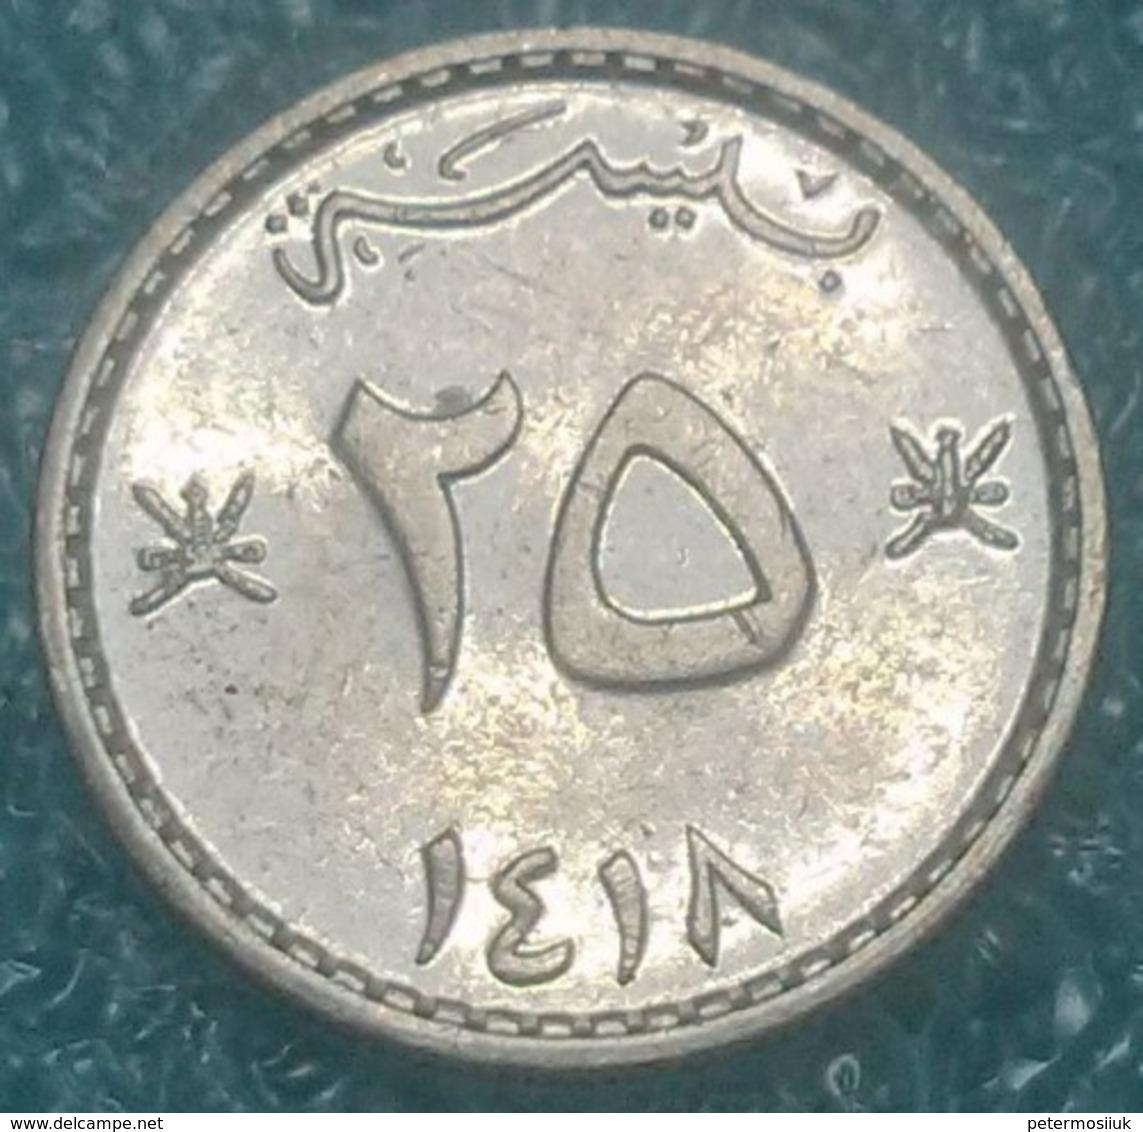 Oman 25 Baisa, 1418 (1997) -4143 - Omán